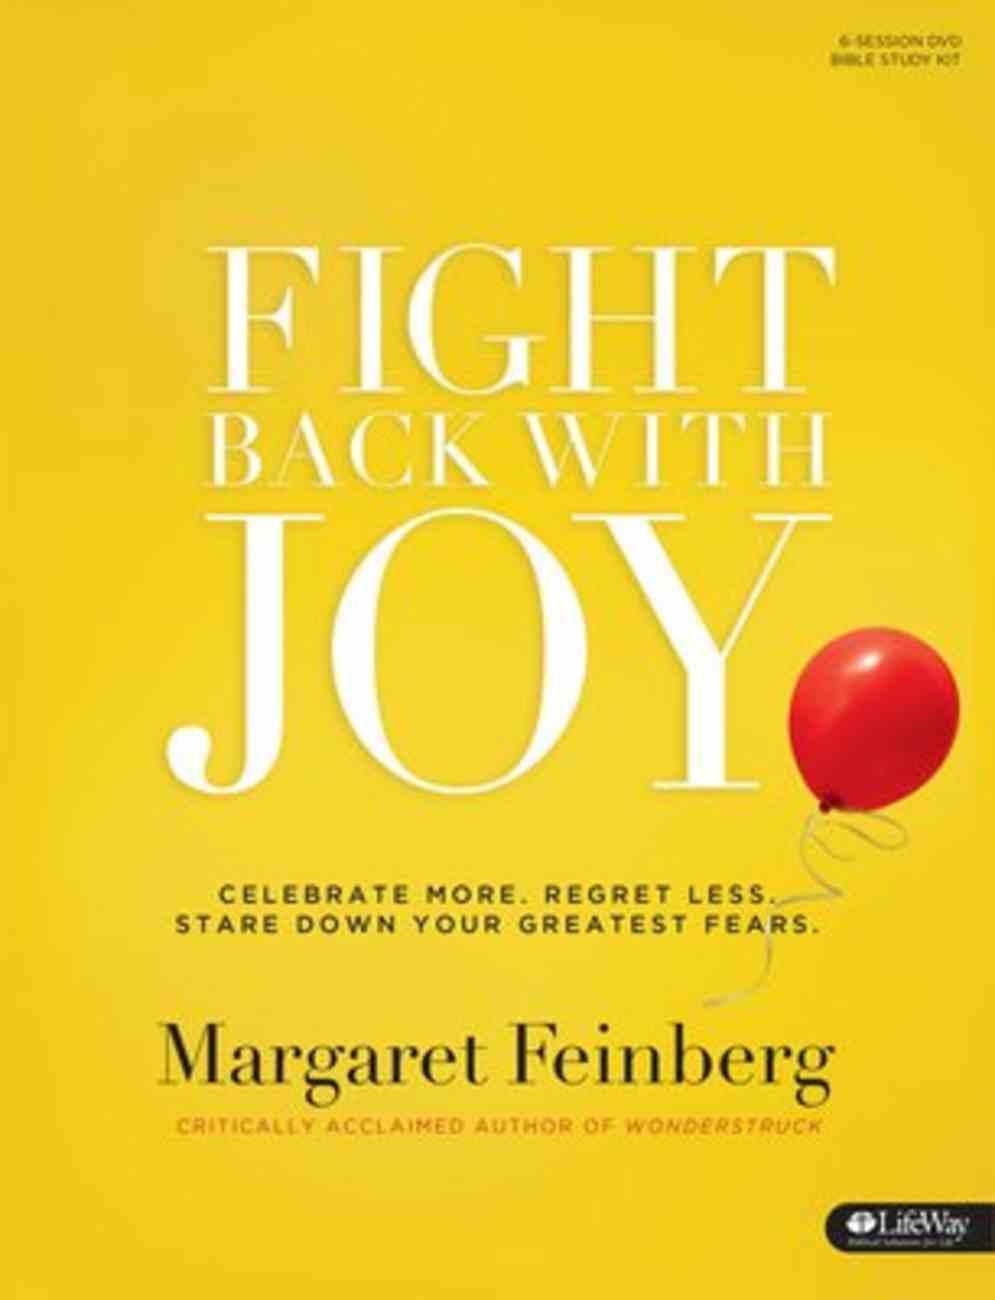 Fight Back With Joy (Leader Kit) Pack